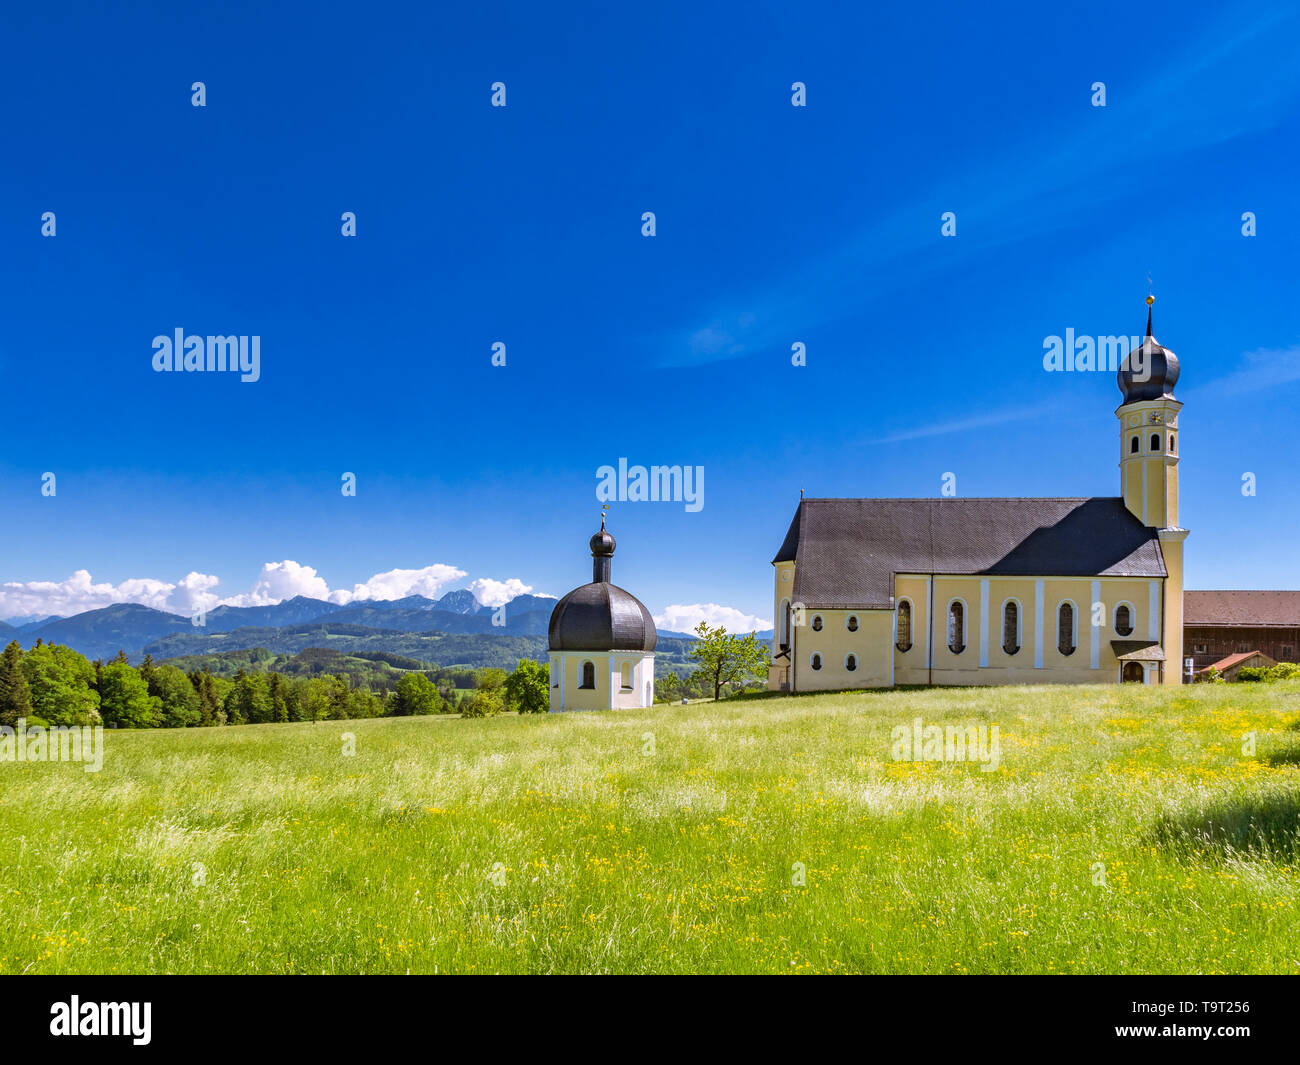 Pilgrimage church Saint Marinus and Anian in Wilparting, municipality Irschenberg, uplands, Upper Bavaria, Bavarians, Germany, Europe, Wallfahrtskirch - Stock Image